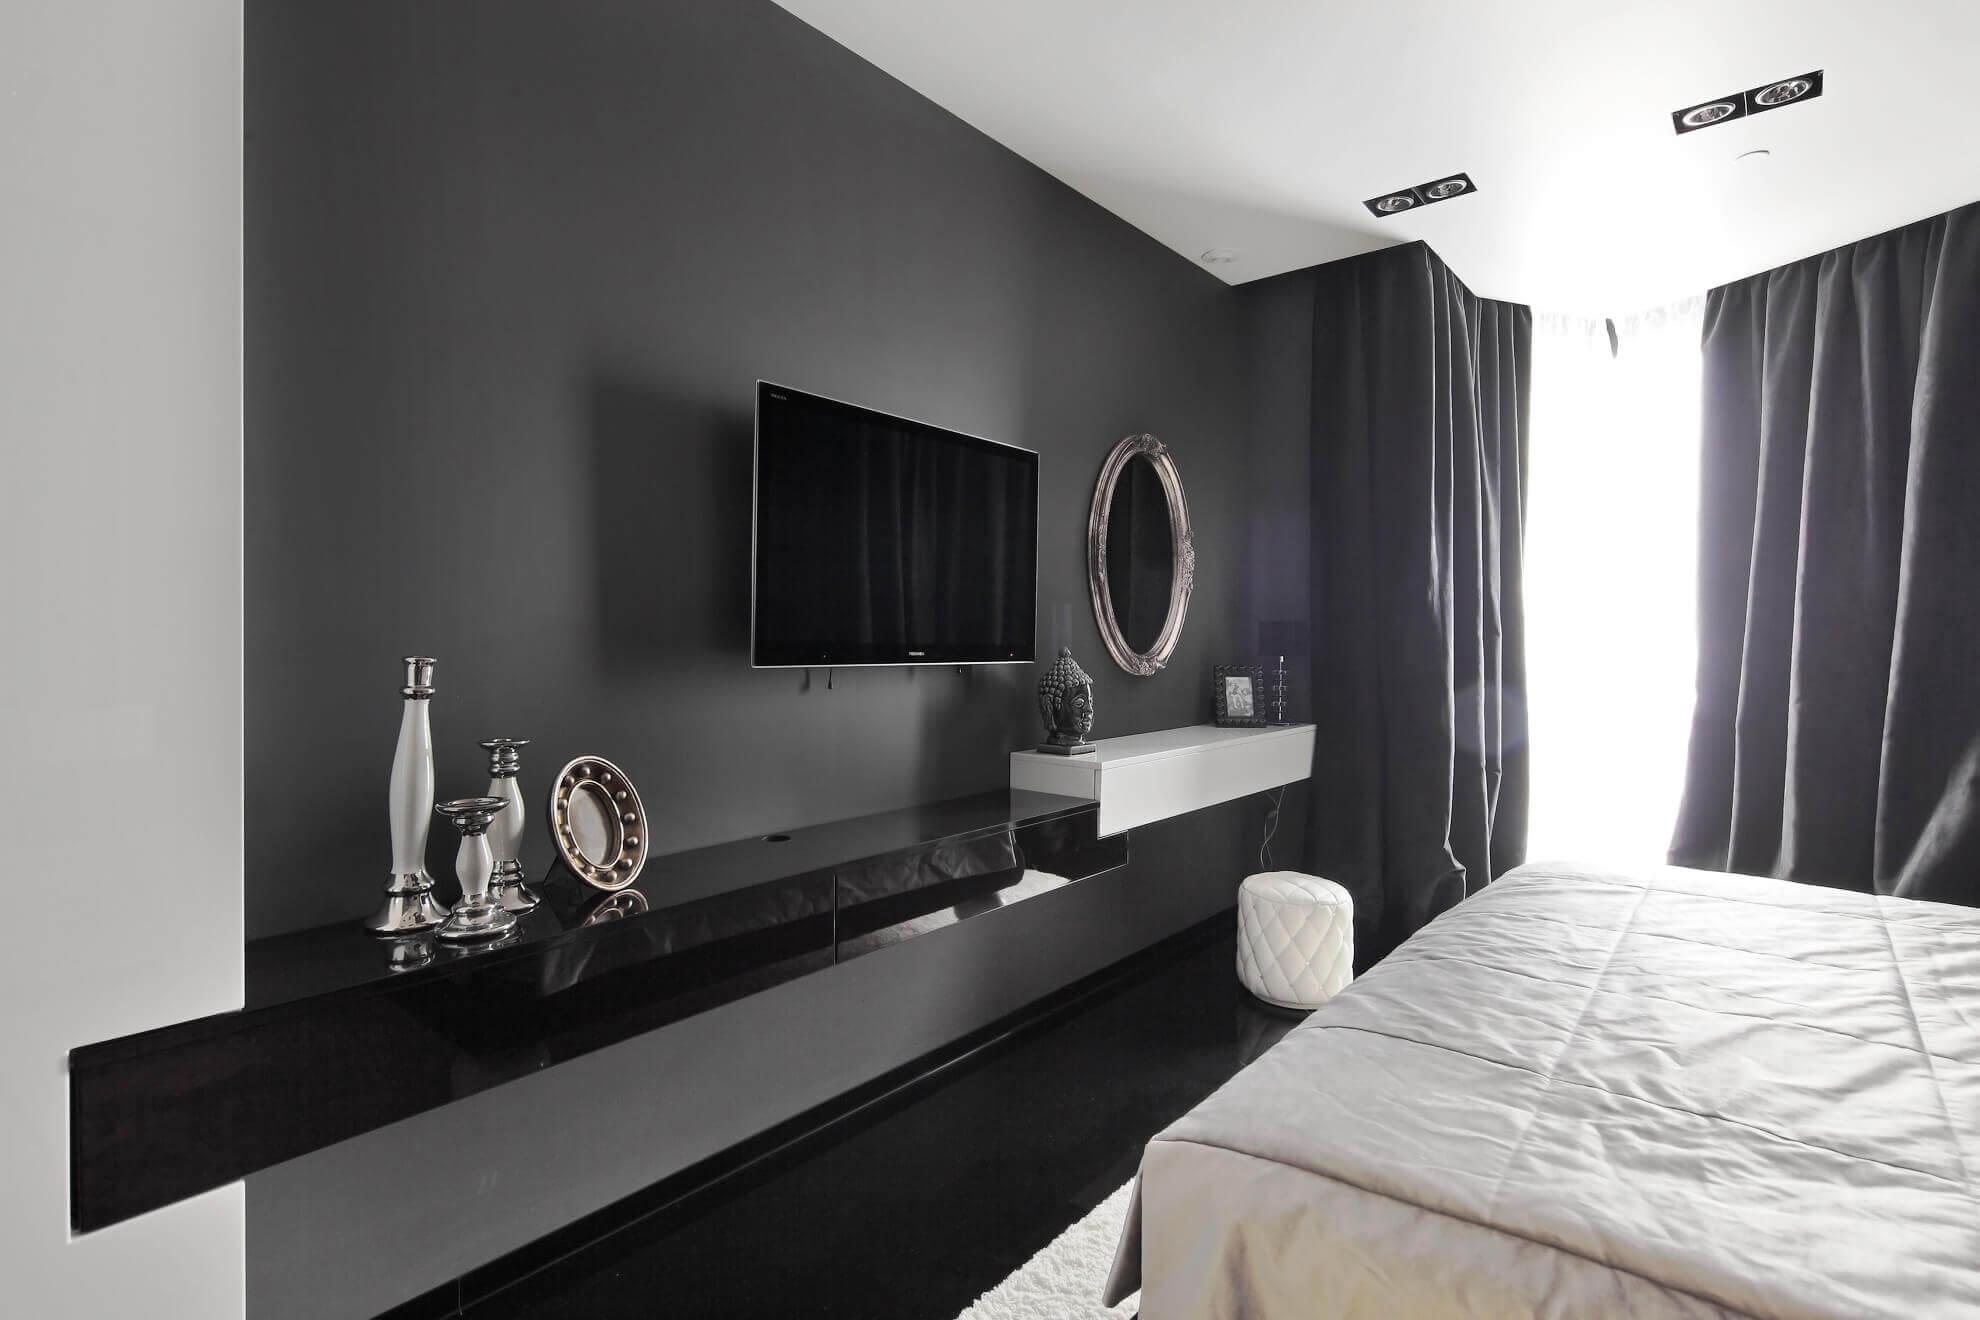 wall-mounted-shelves-bedroom-3.jpg